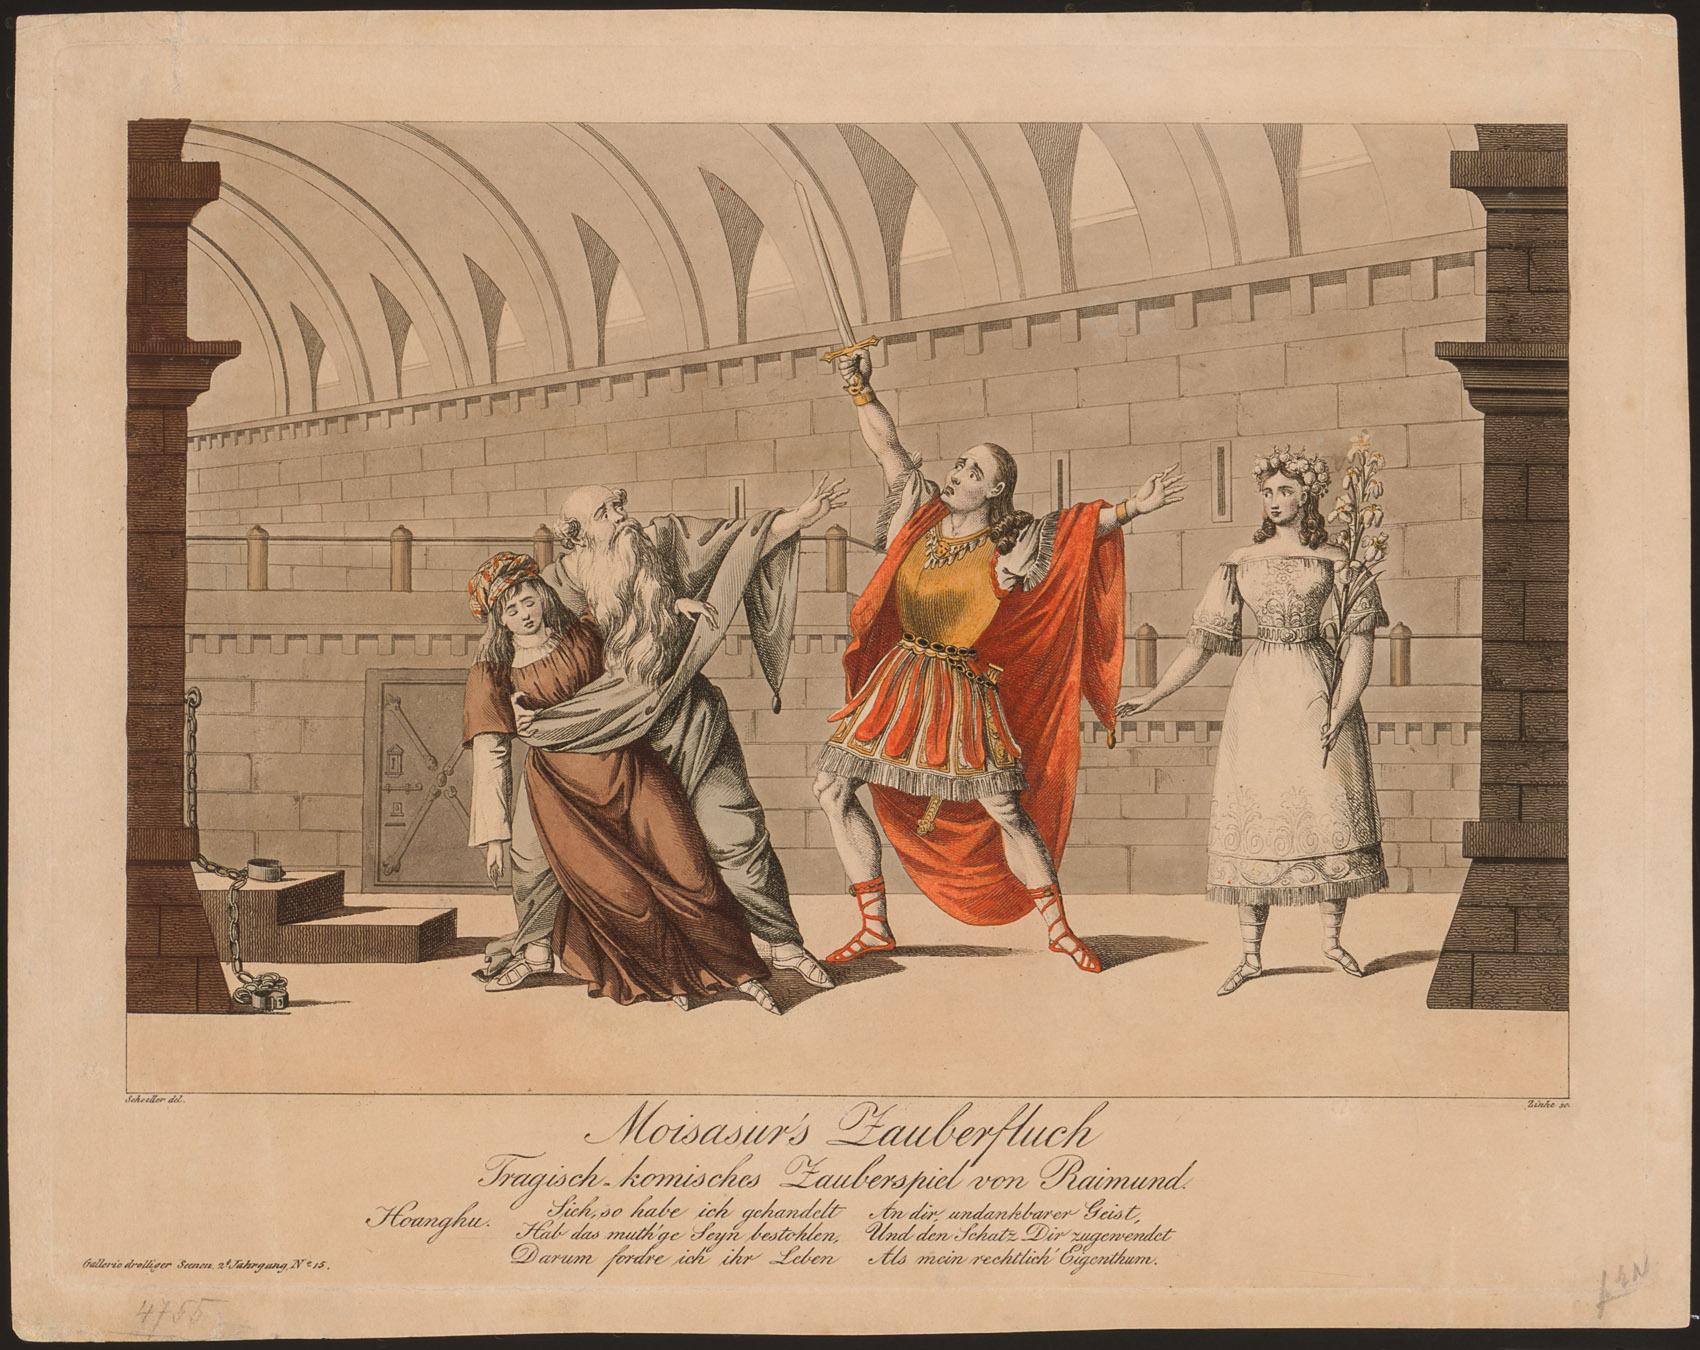 Moisasur's Zauberfluch von Johann Christian Schoeller